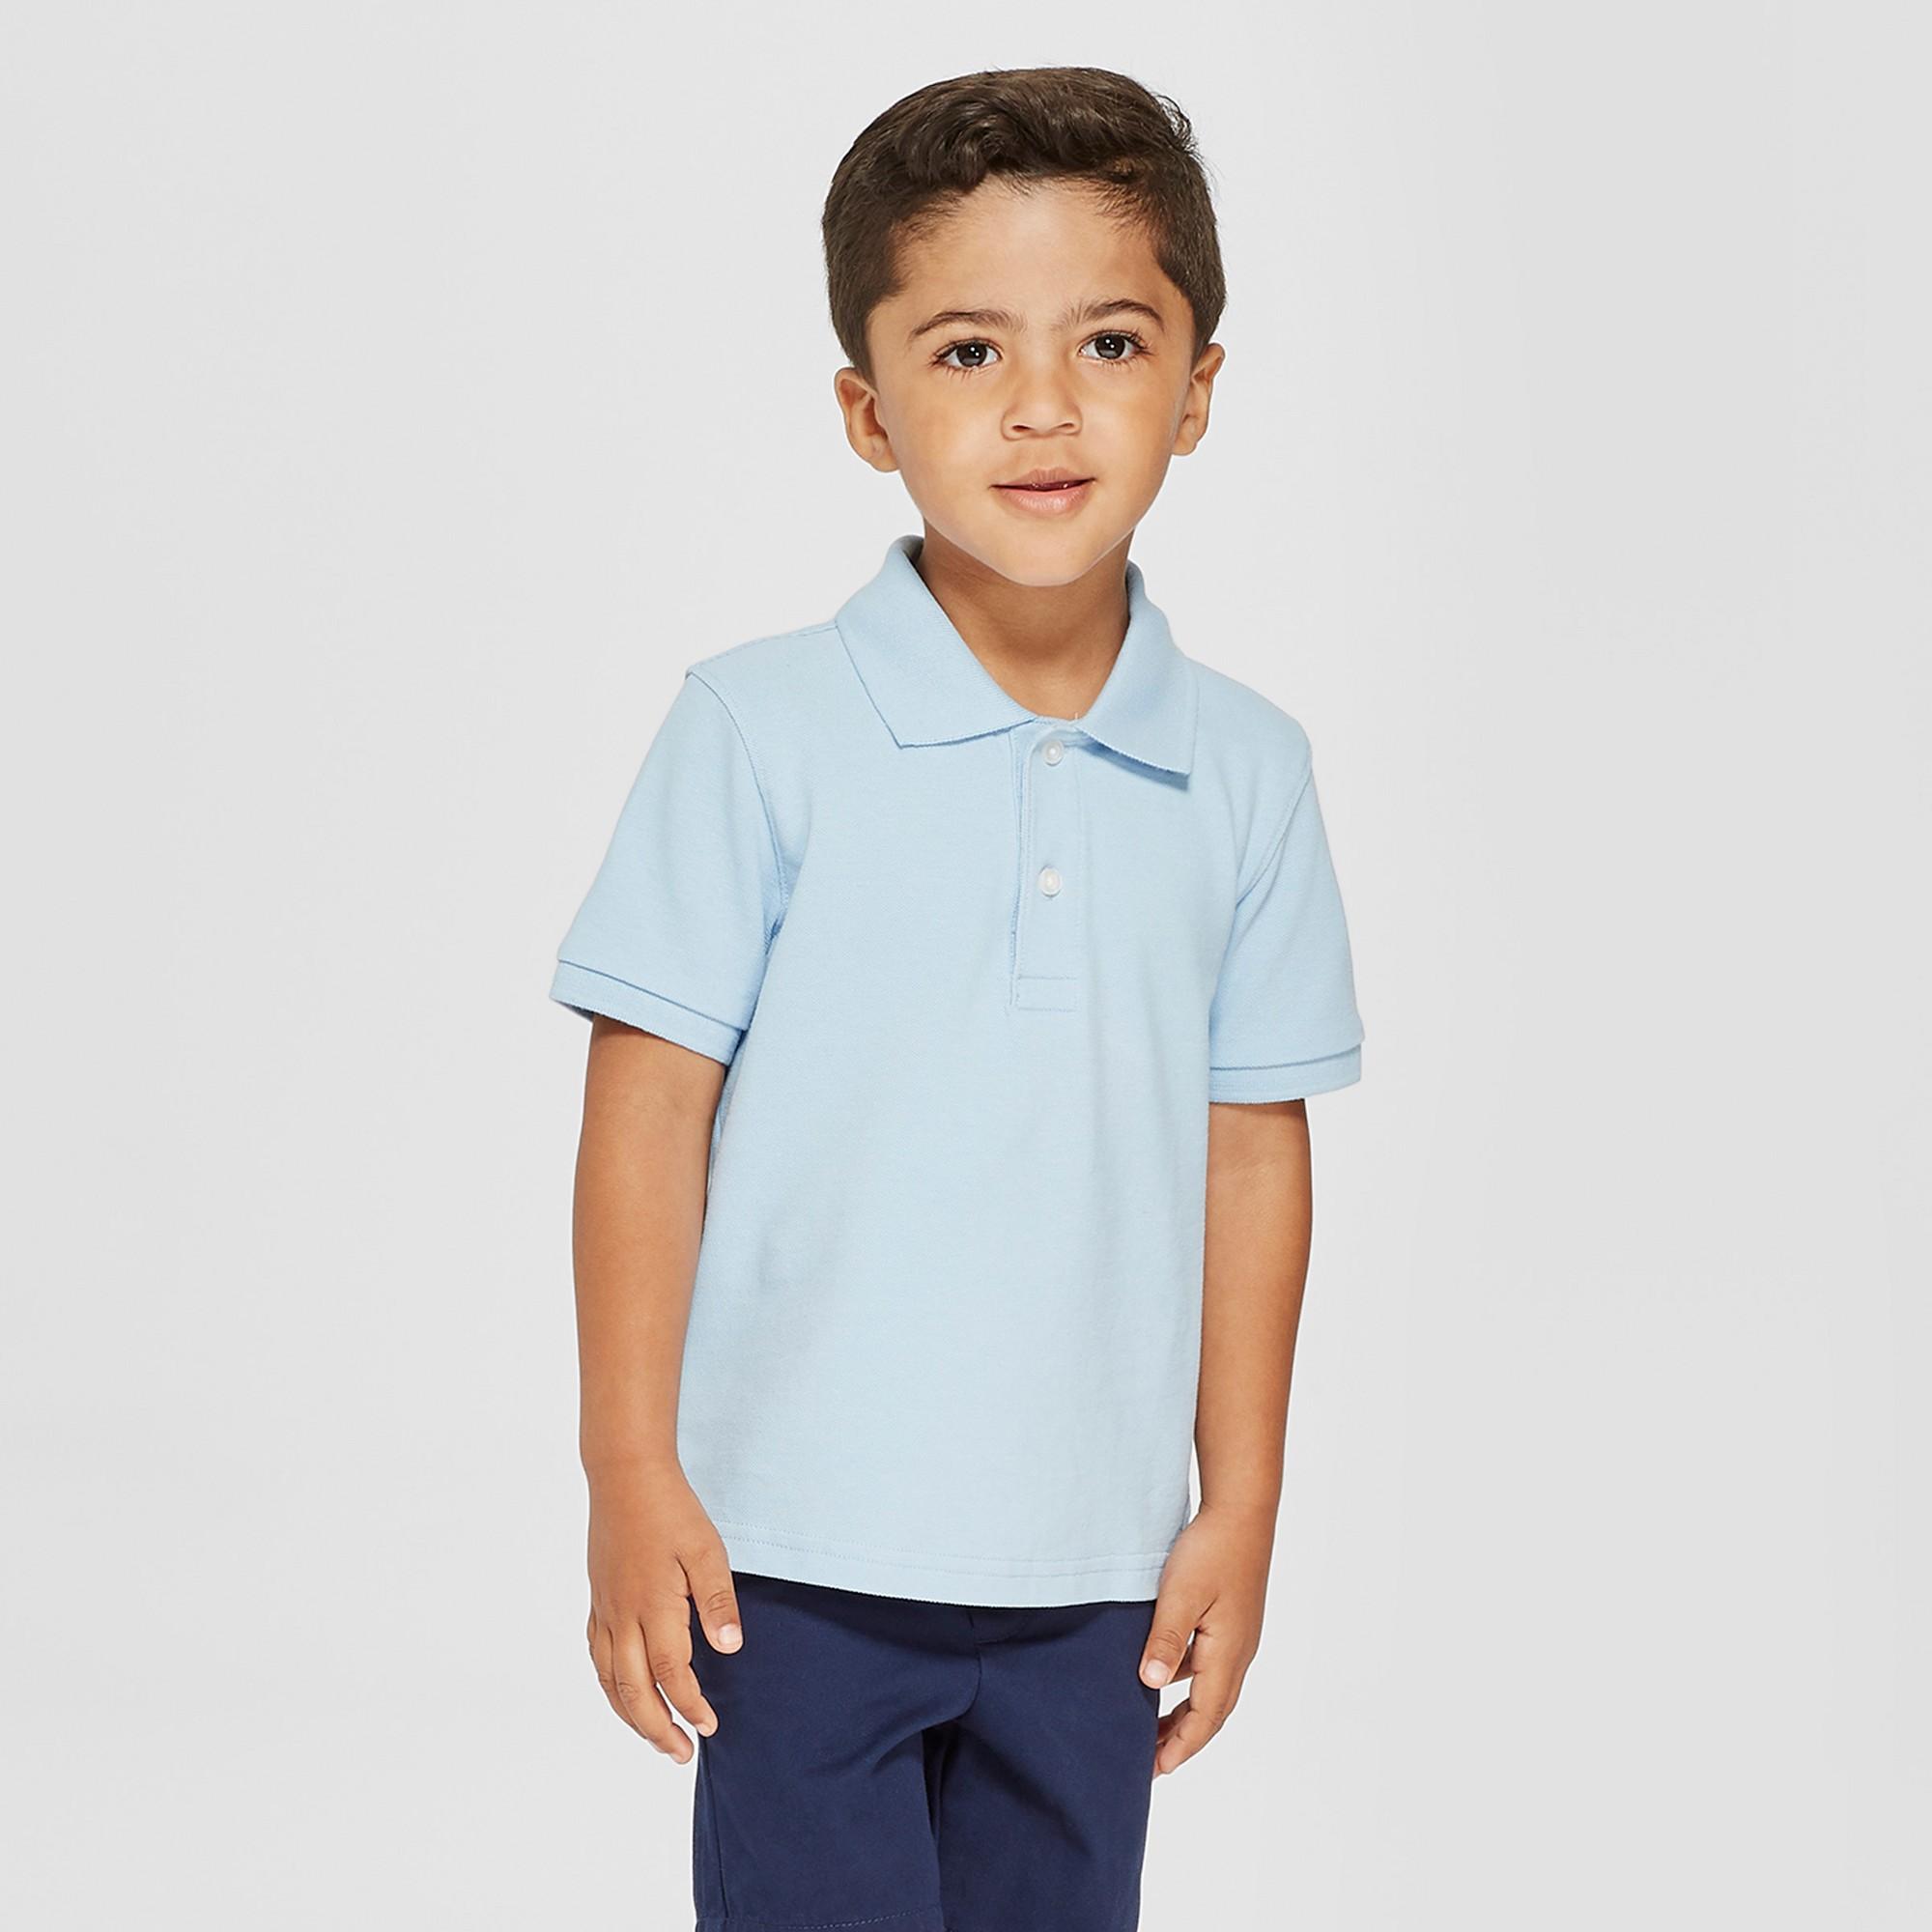 6cedc59f6 Toddler Boys' Short Sleeve Pique Uniform Polo Shirt - Cat & Jack Blue 3T